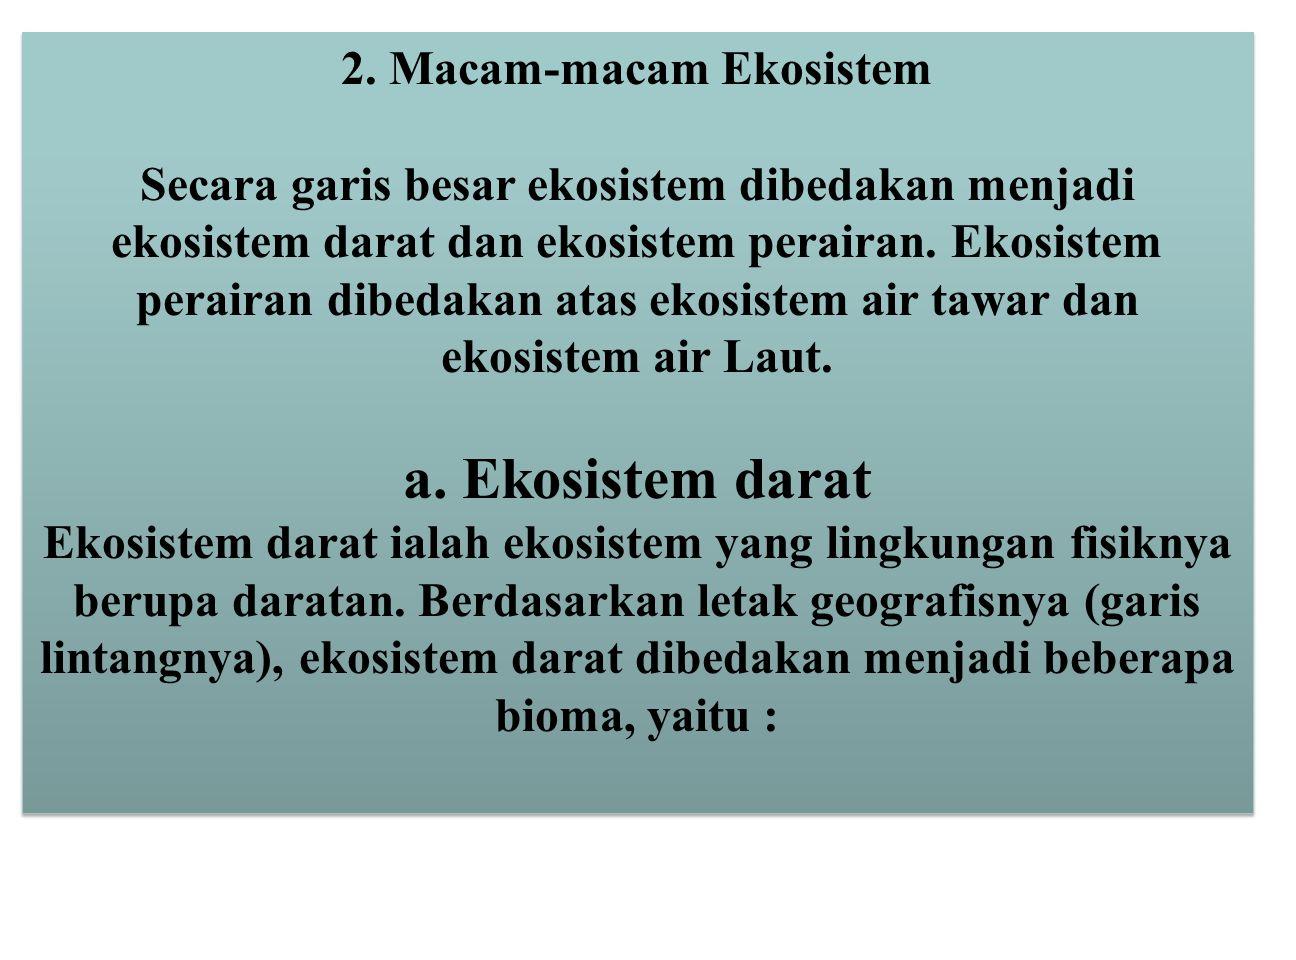 2. Macam-macam Ekosistem